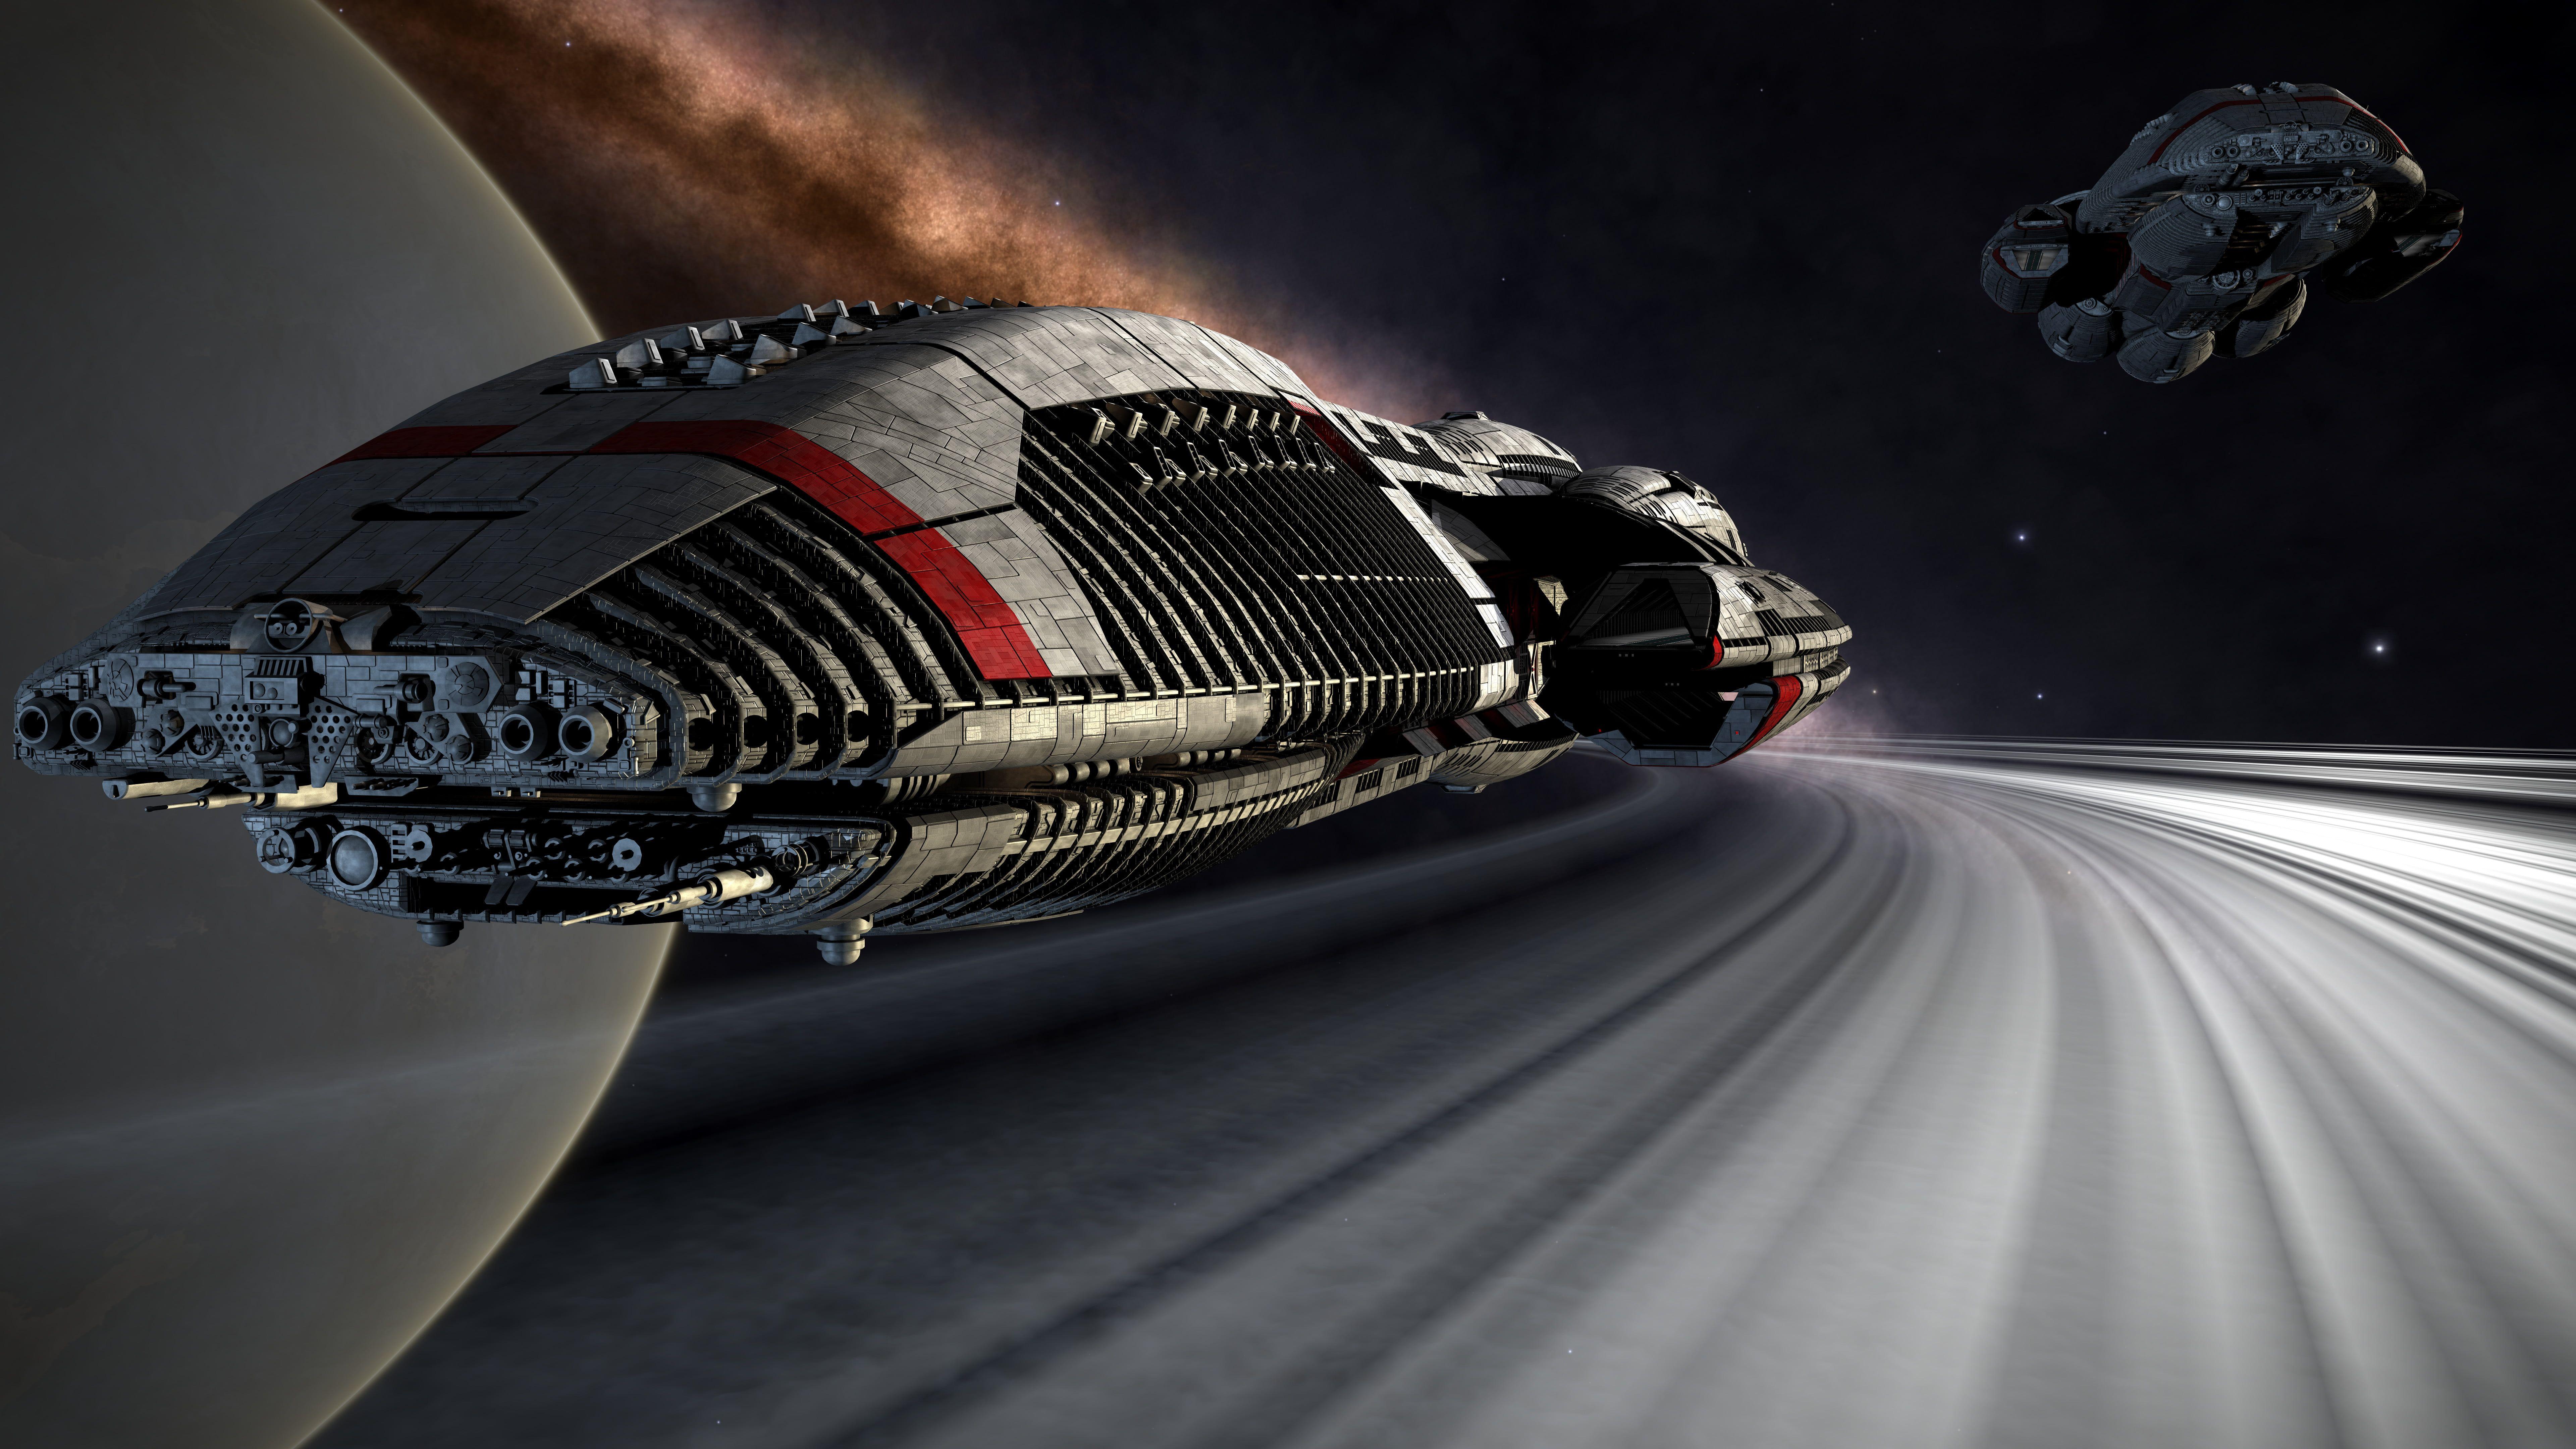 Gray Spaceship Science Fiction Futuristic Battlestar Galactica Digital Art Artwork 3d Render Space 8k Space Art Wallpaper Battlestar Galactica Wallpaper